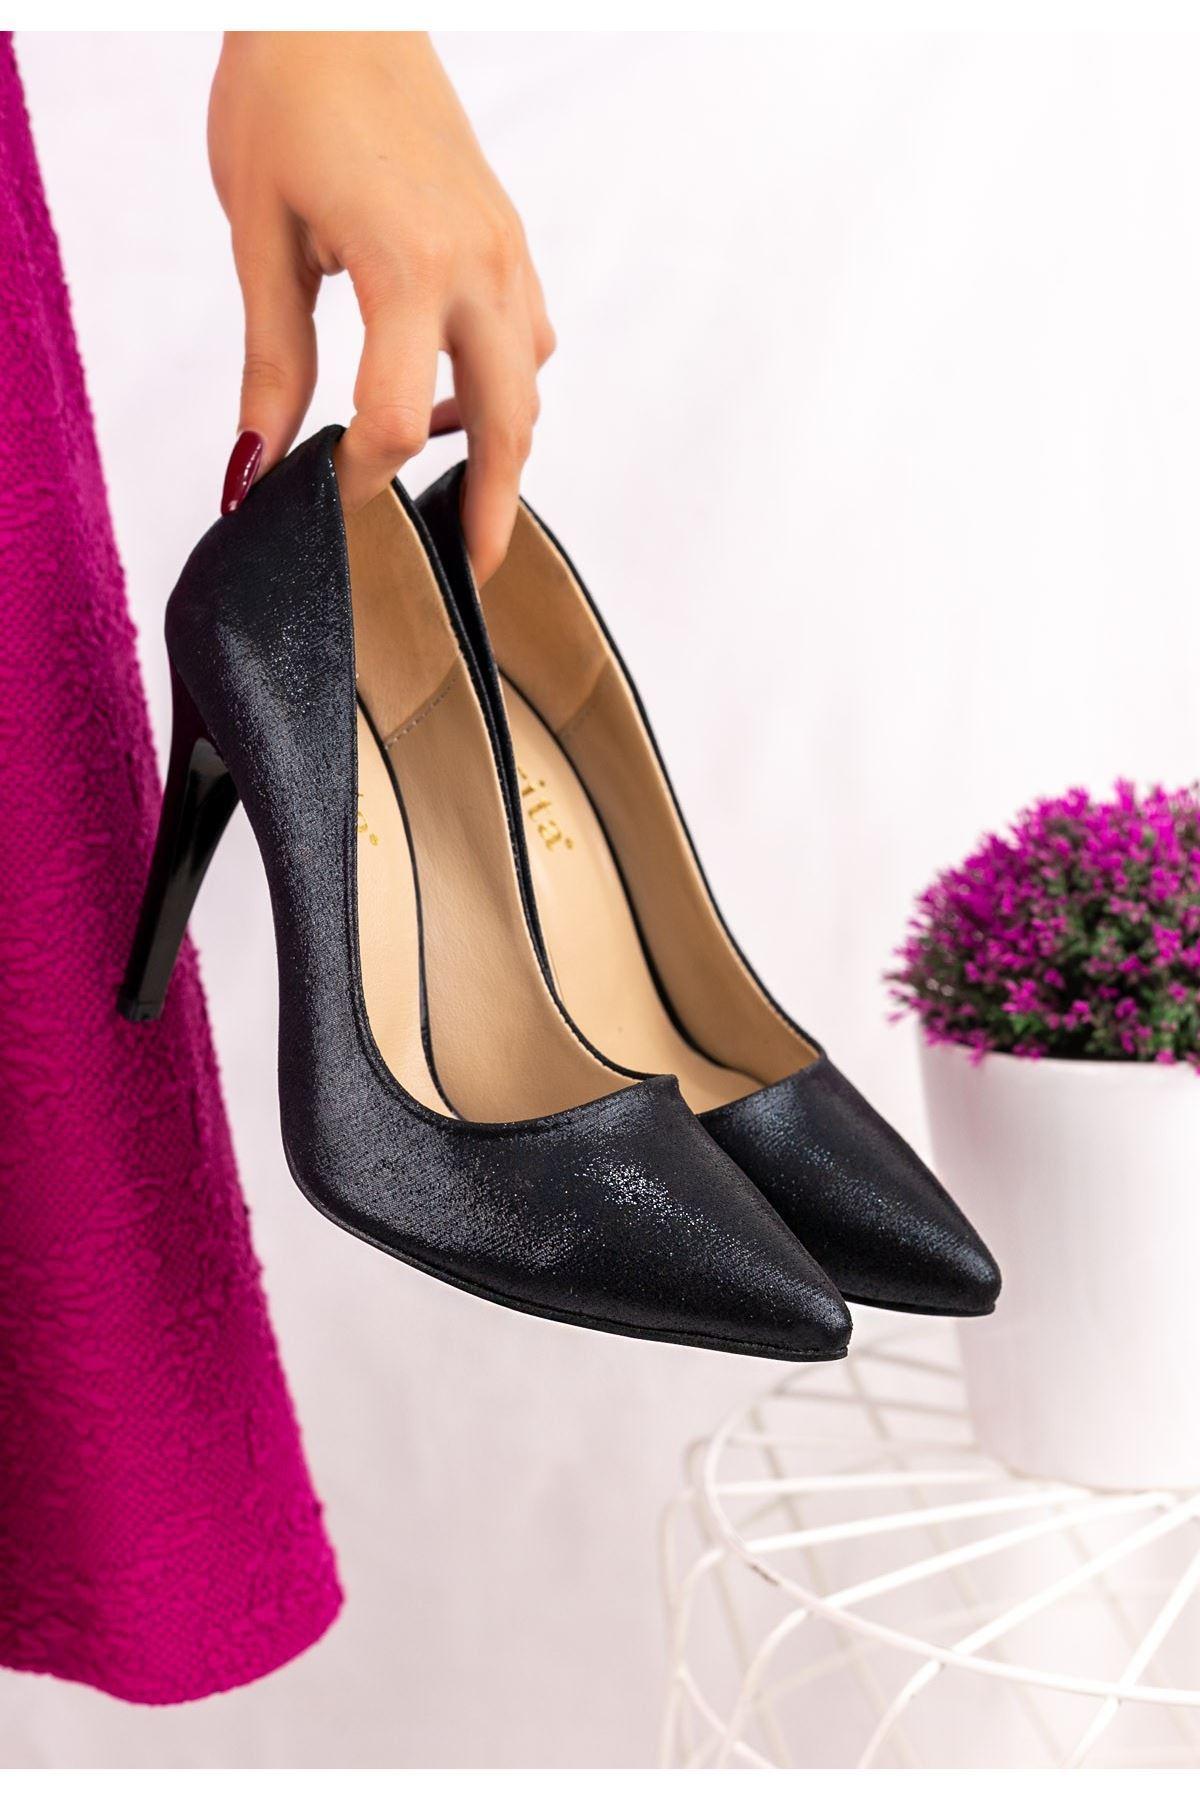 Taylox Siyah Simli Stiletto Ayakkabı